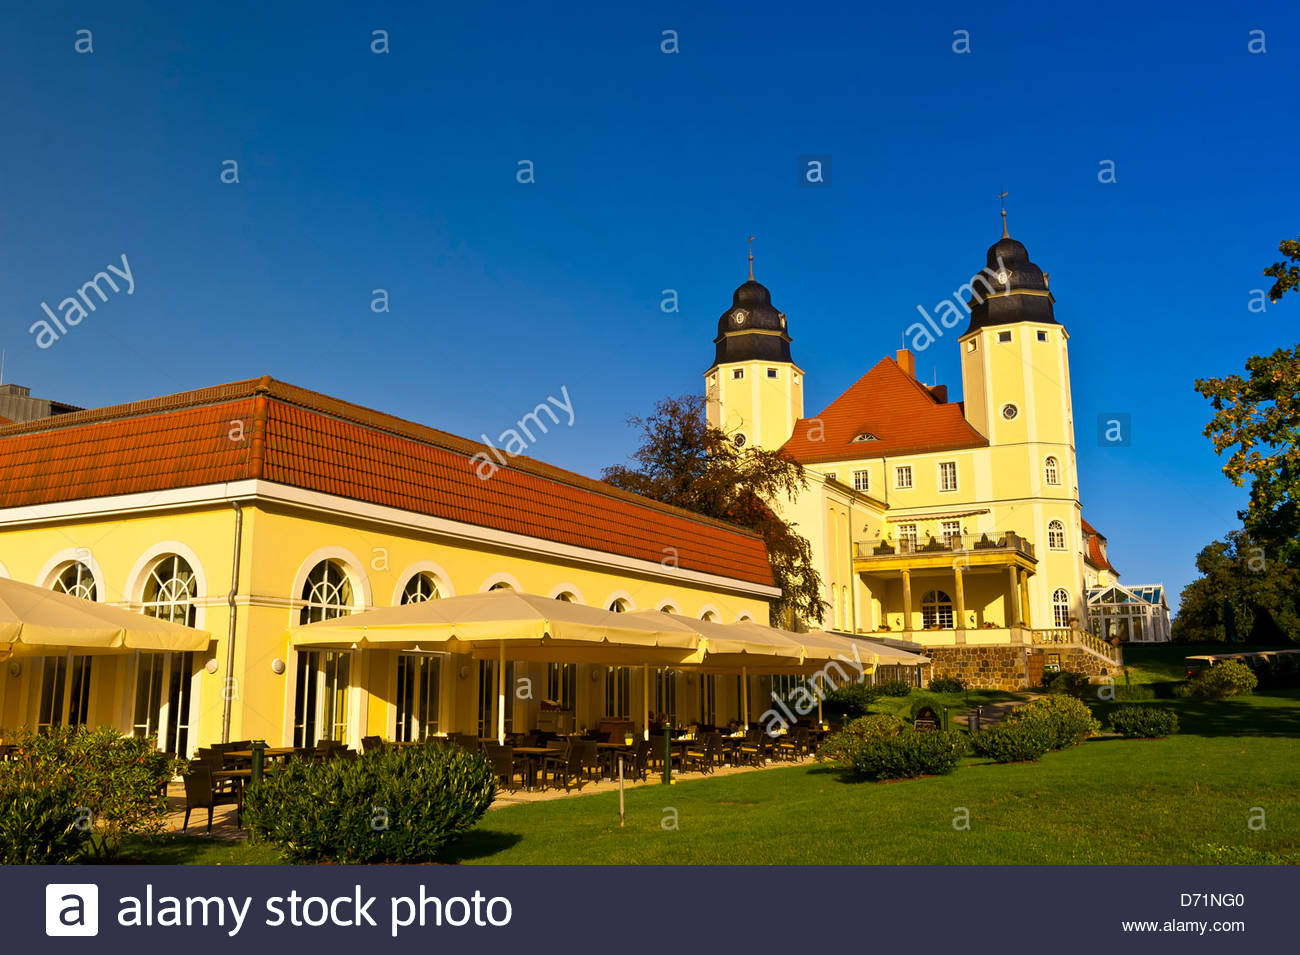 Radisson Blu Resort Schloss Fleesensee (castle hotel), Fleesensee, Germany - Stock Image